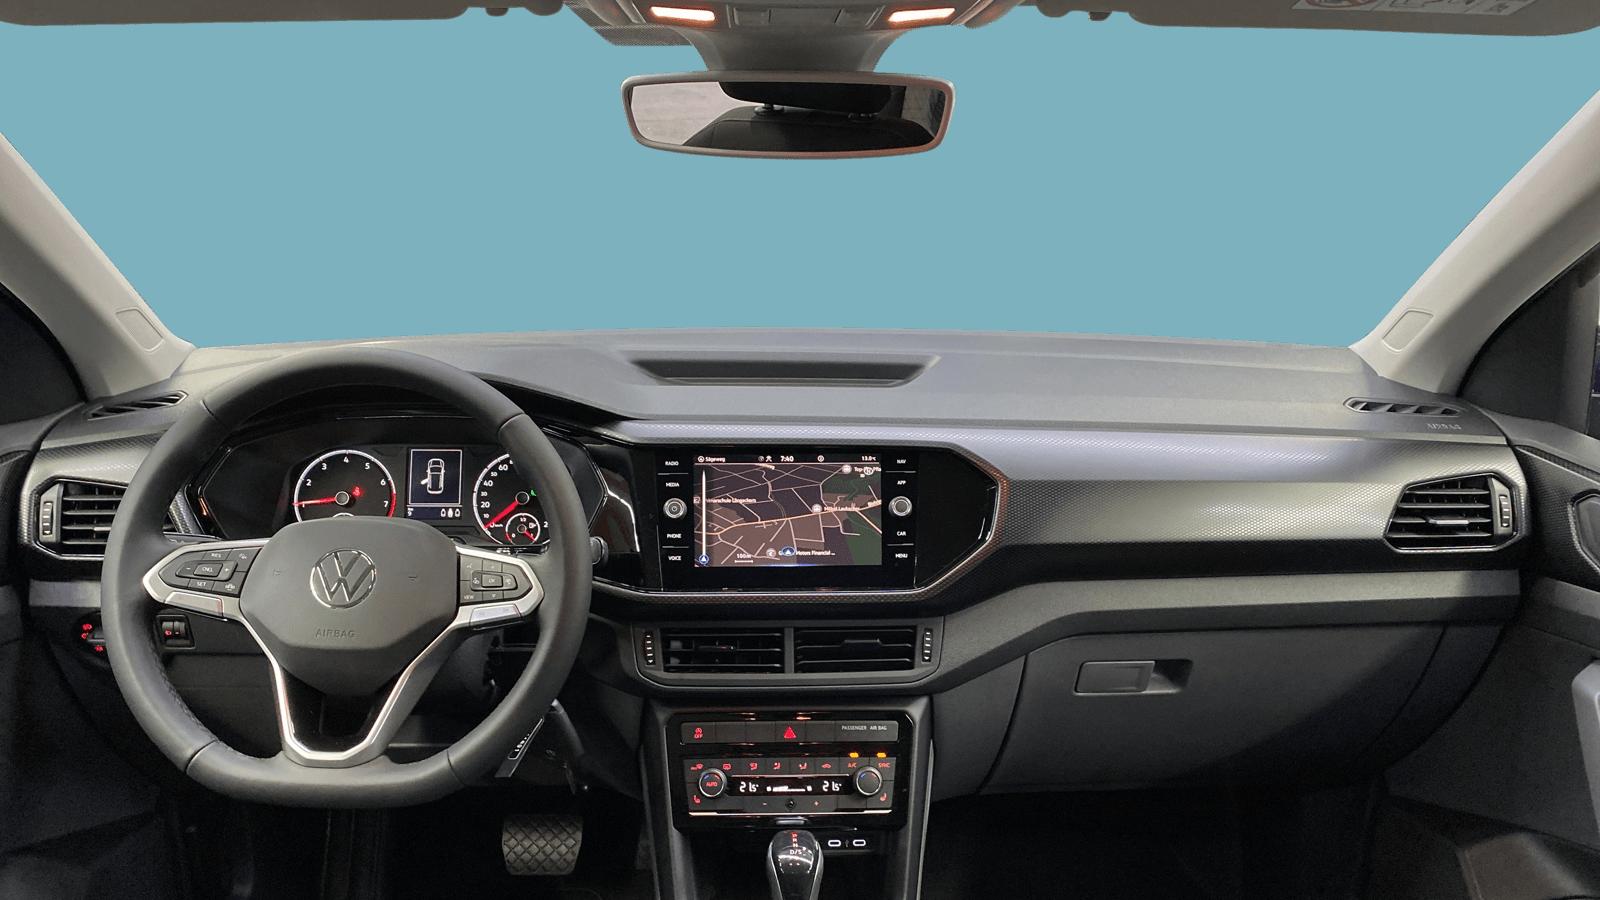 VW T-Cross Blue interior - Clyde car subscription